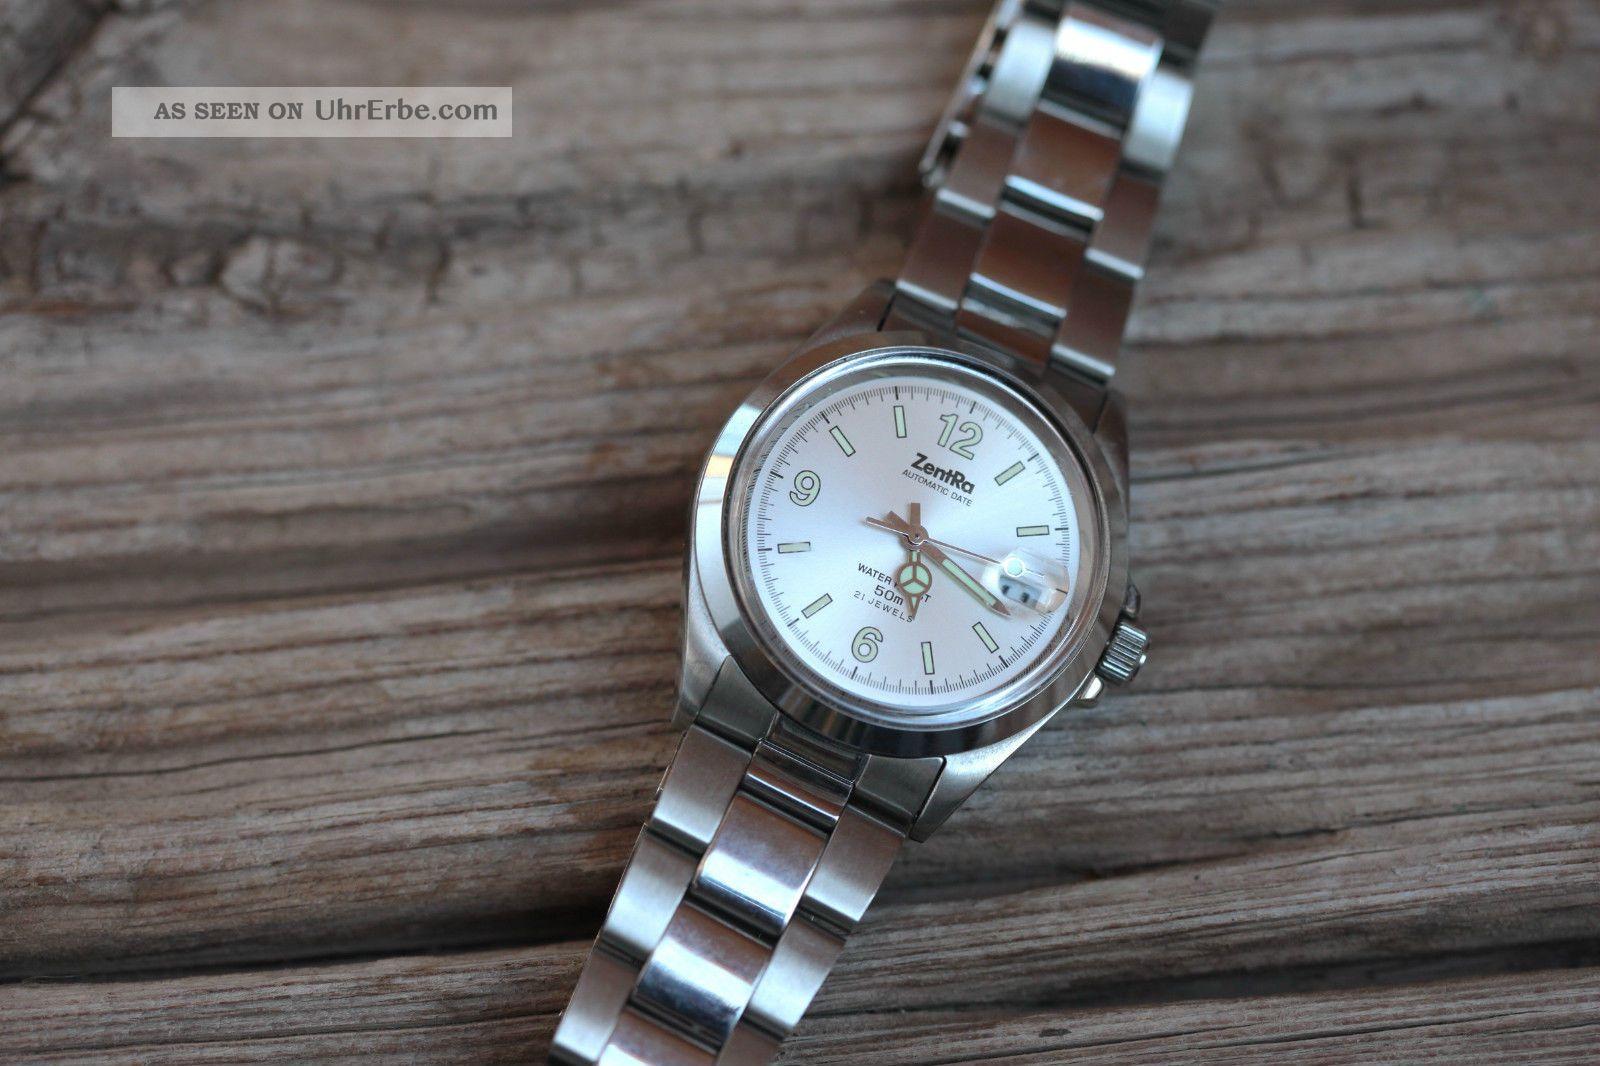 Zentra Automatic Herrenarmbanduhr Mit Edelstahlarmband Armbanduhren Bild